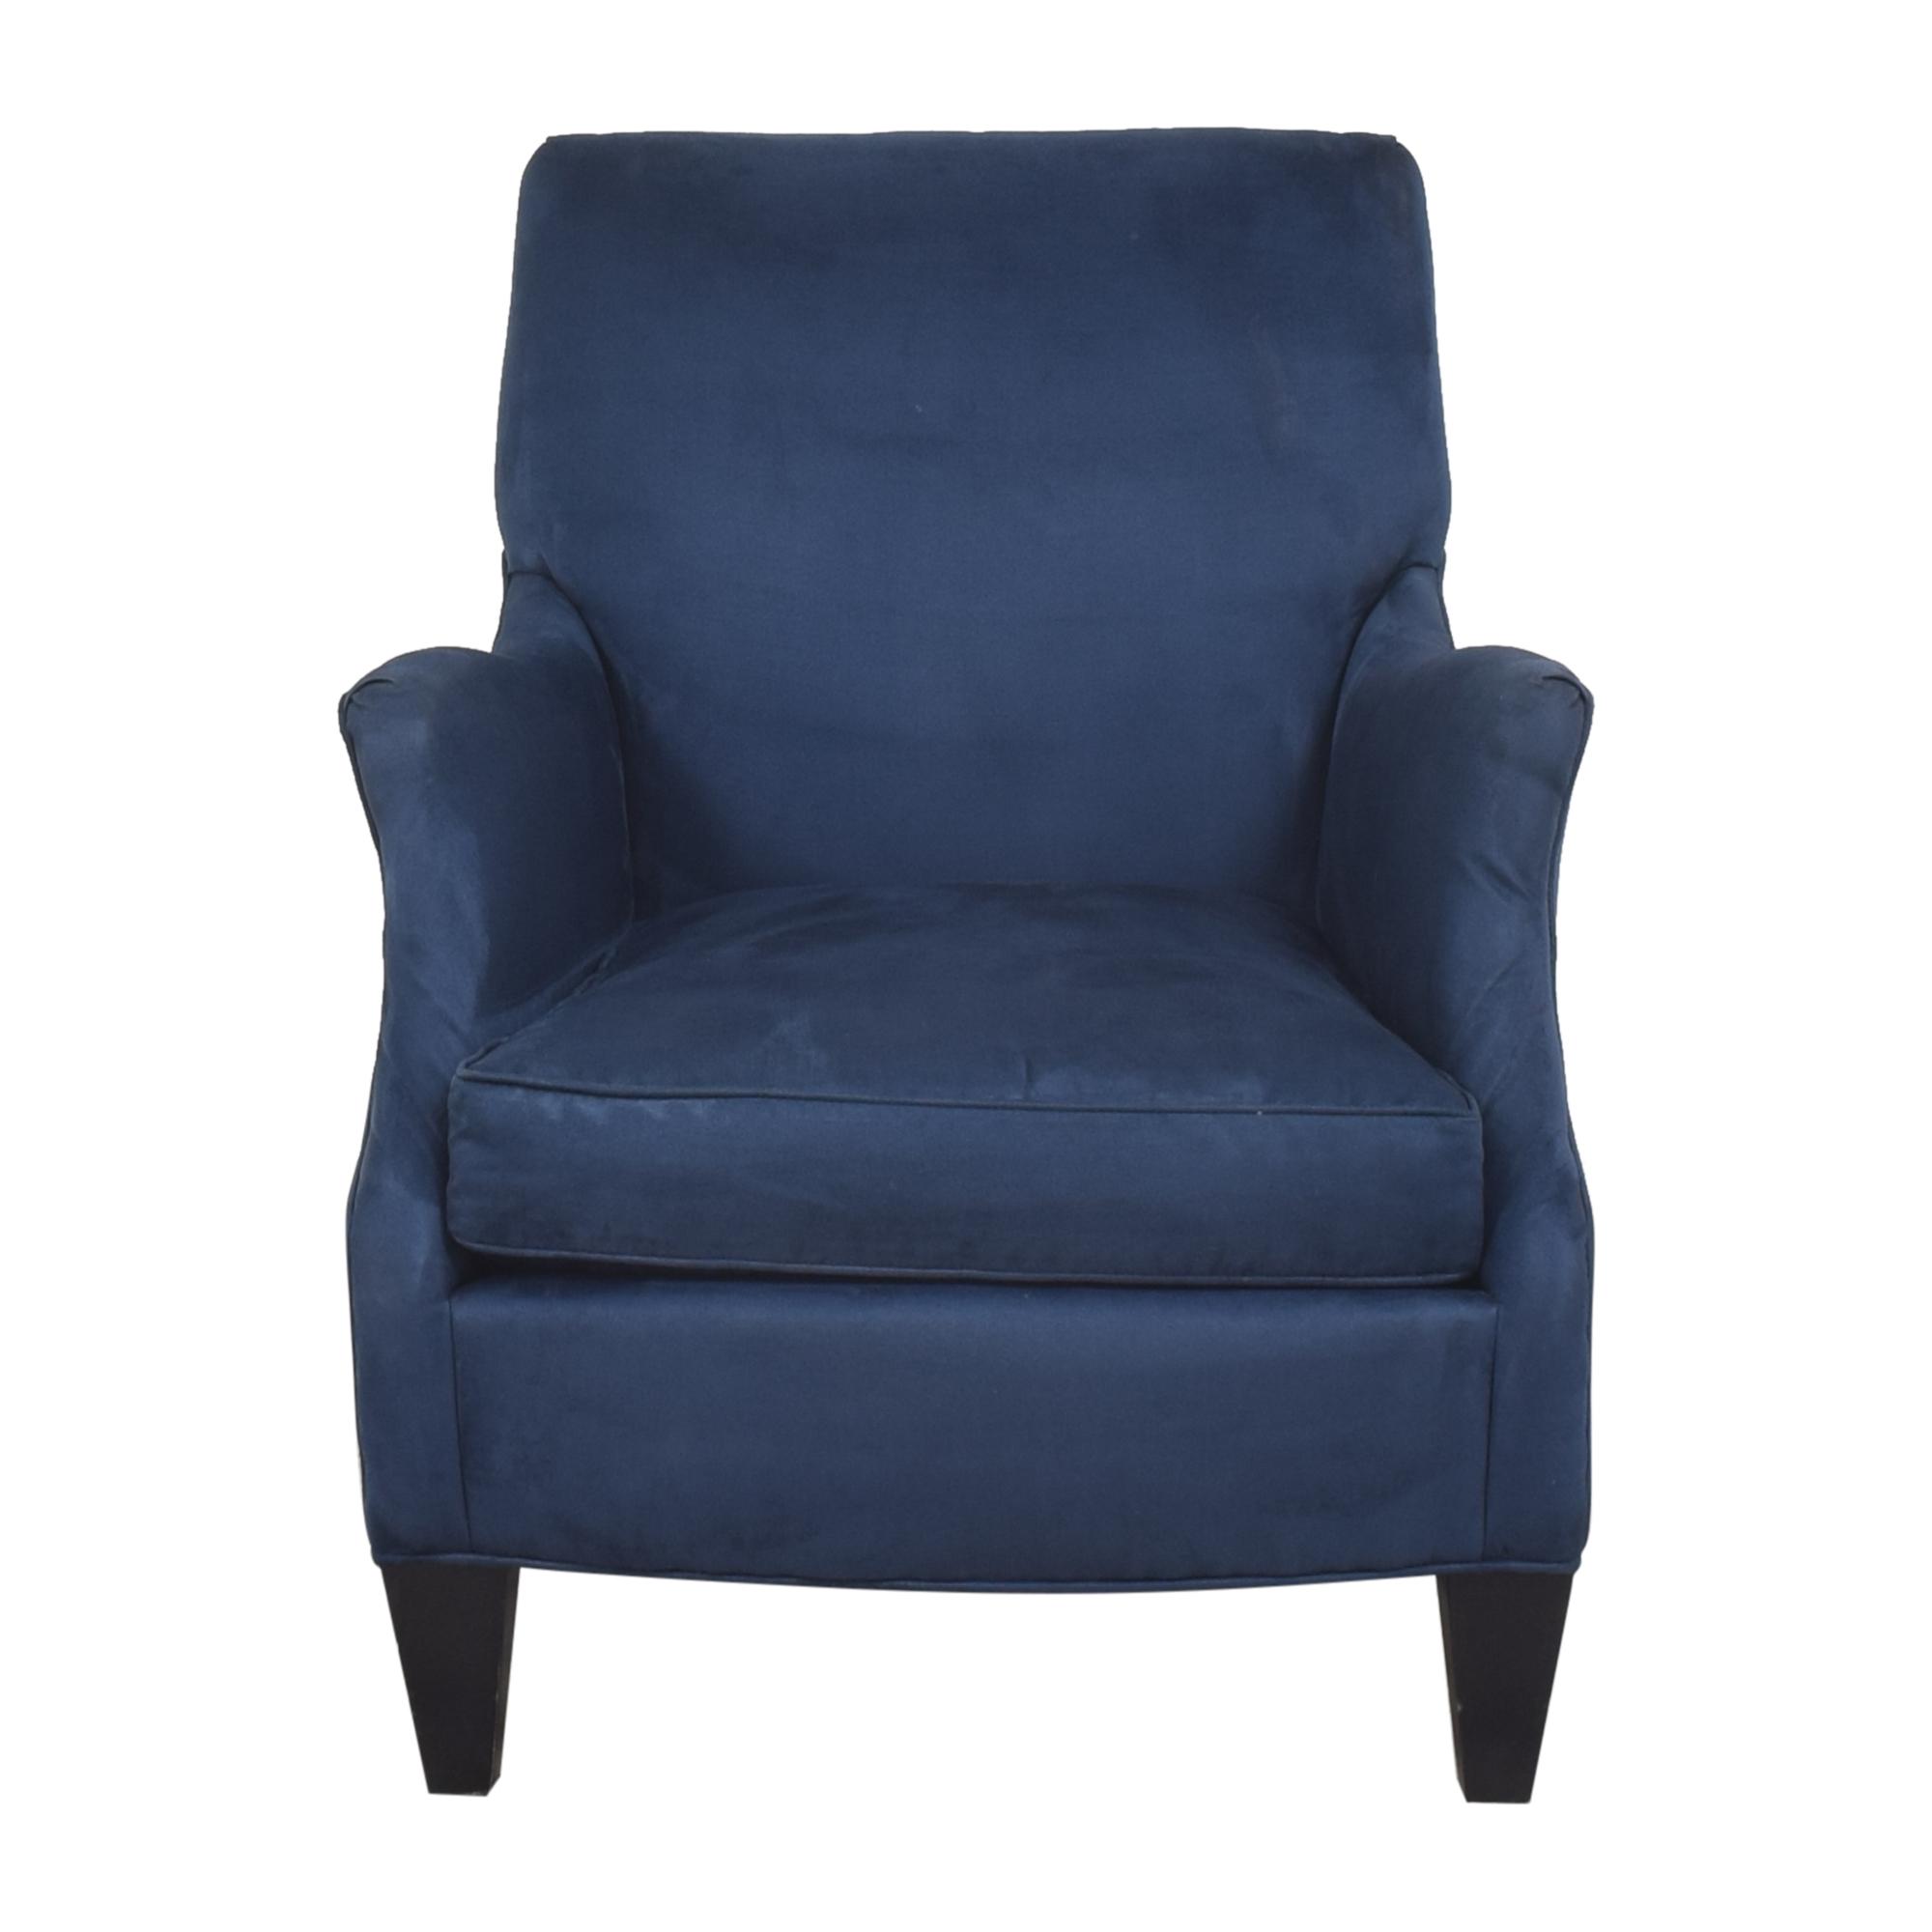 shop Ballard Designs Accent Chair Ballard Designs Chairs